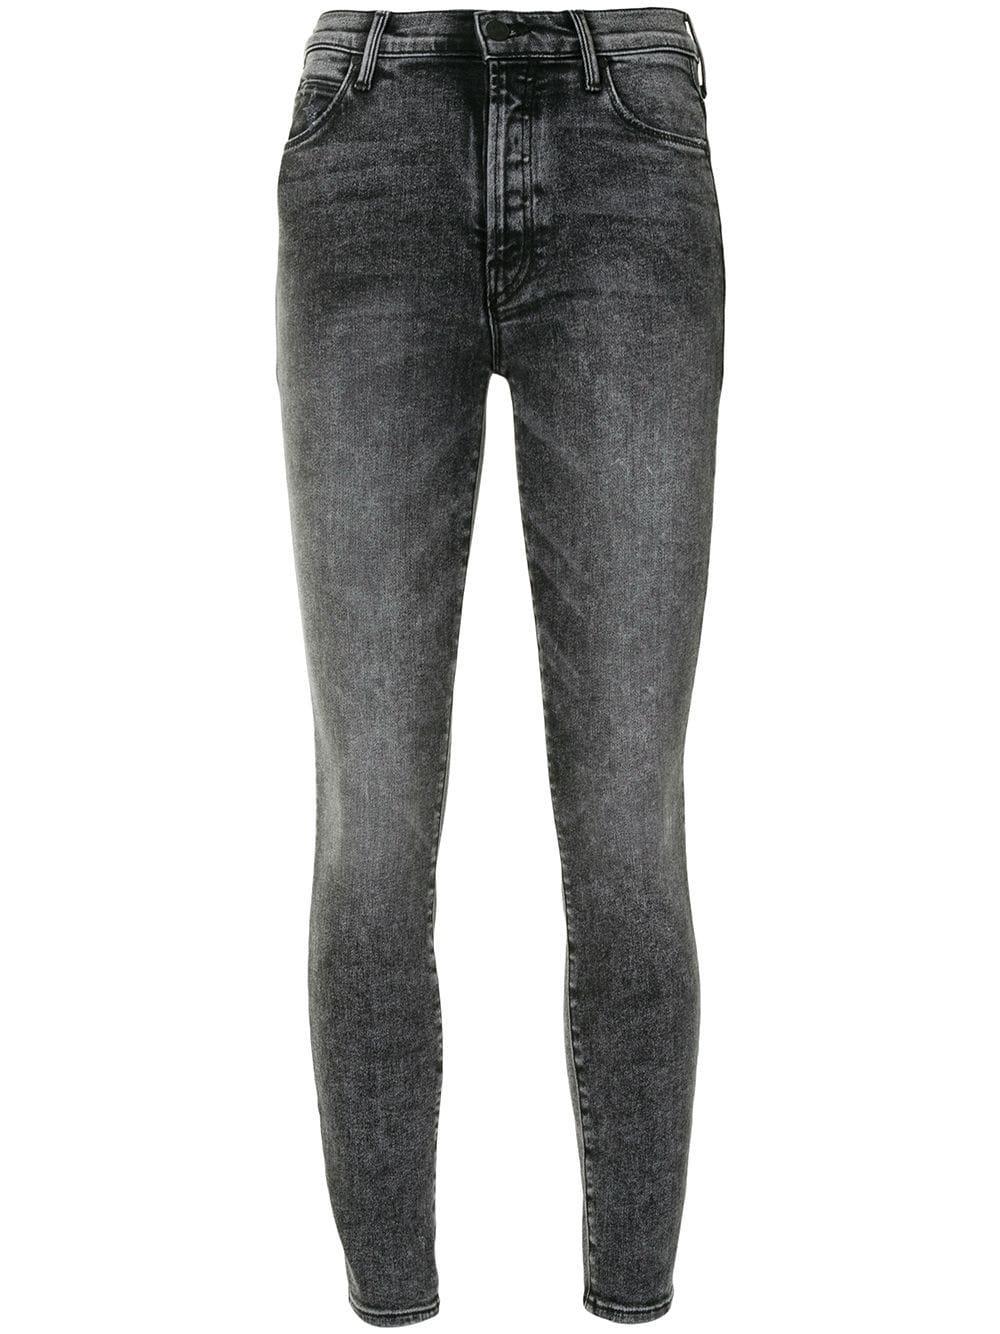 The Stunner Skinny Jeans Item # 1841-851